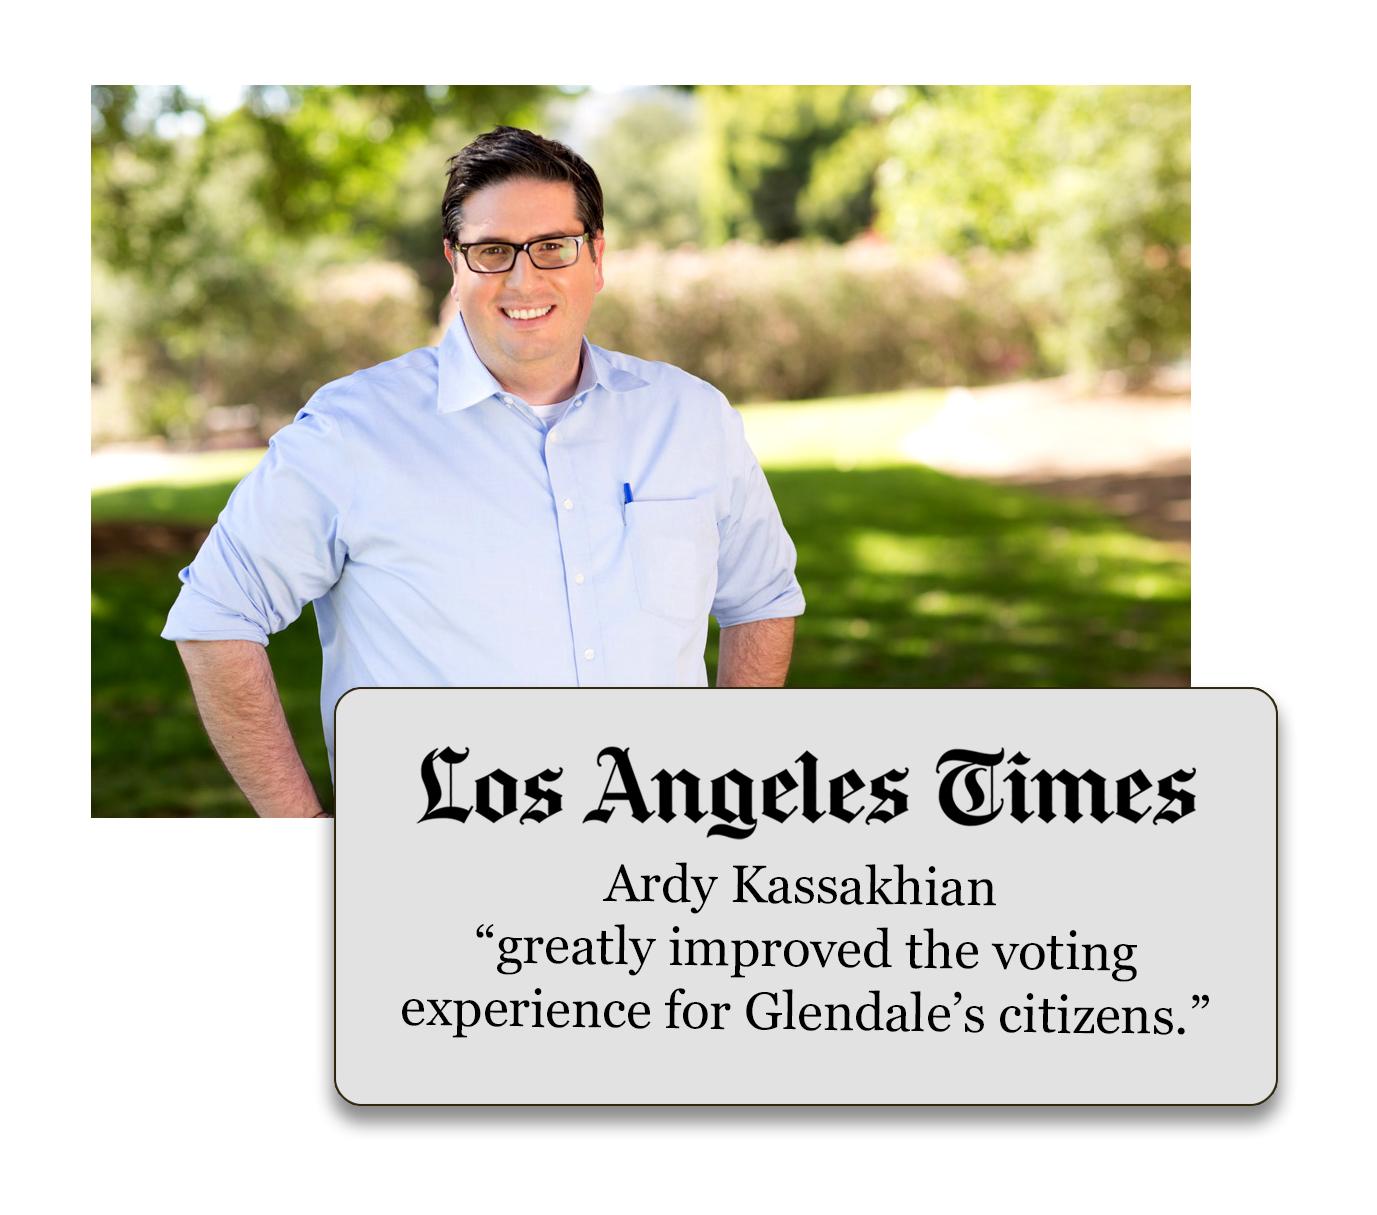 Ardy-Record-LA-Times-Graphic.jpg